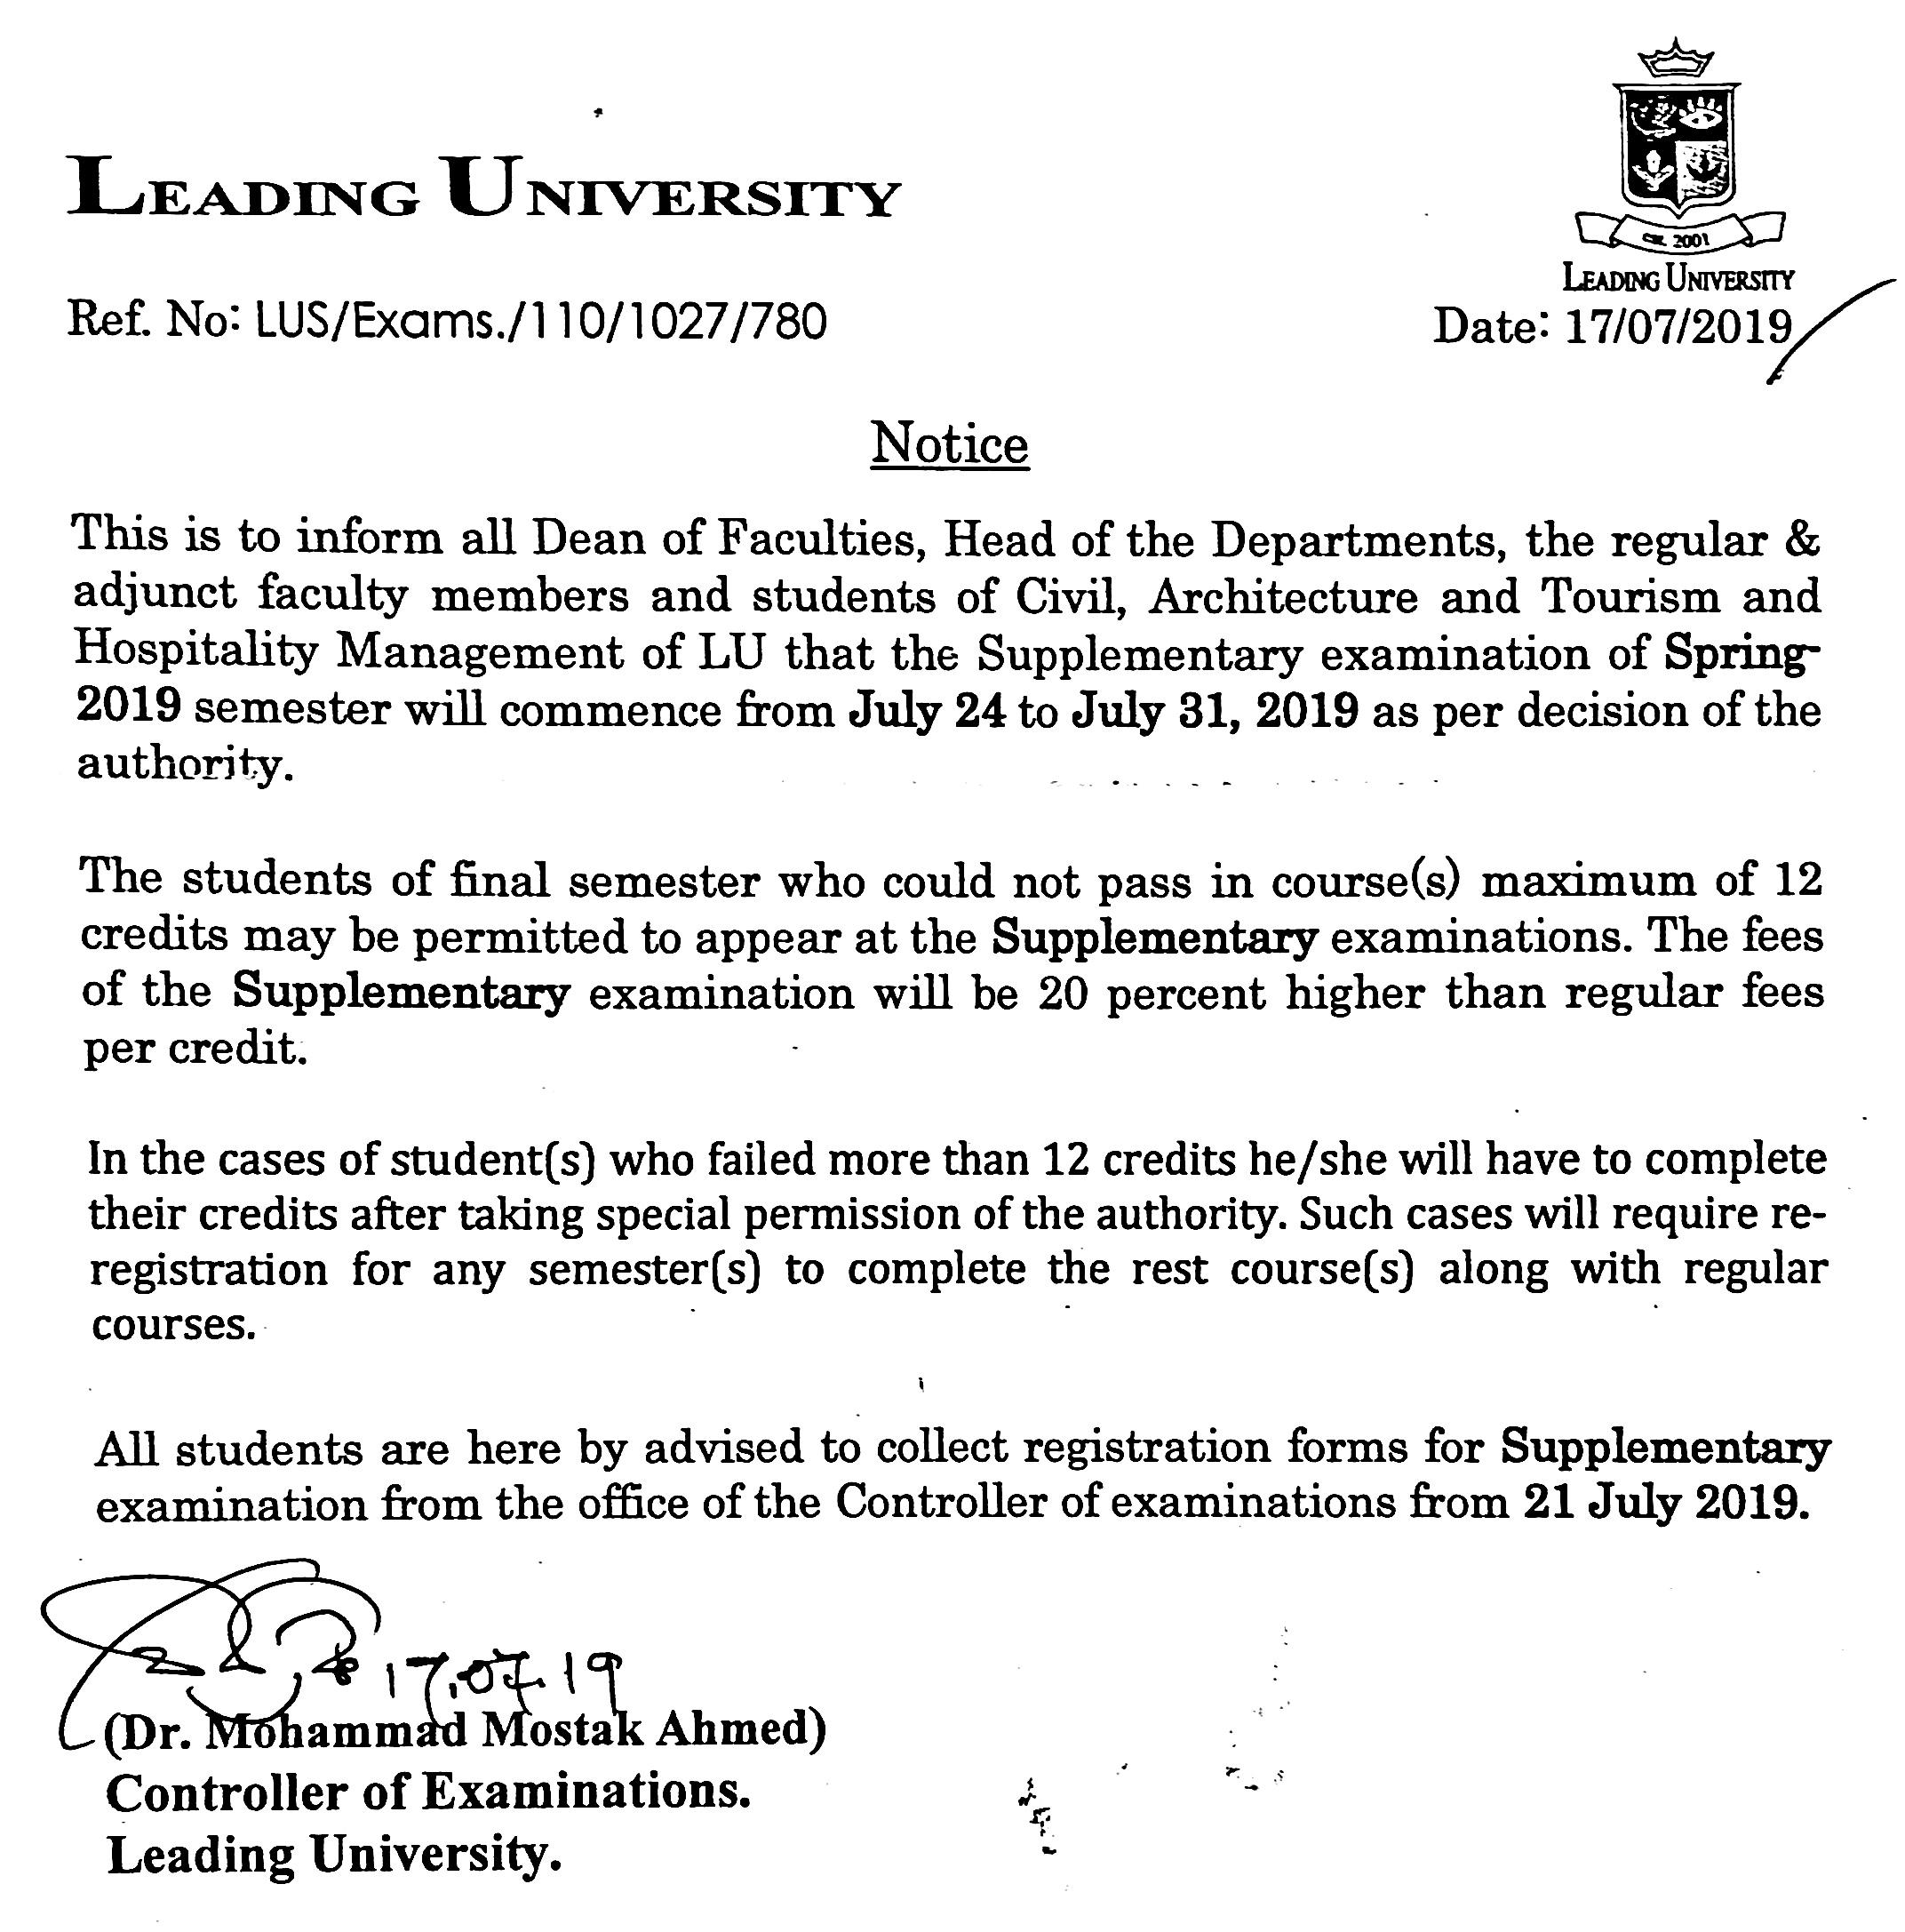 Notice regarding the Supplementary exam of Spring 2019 semester